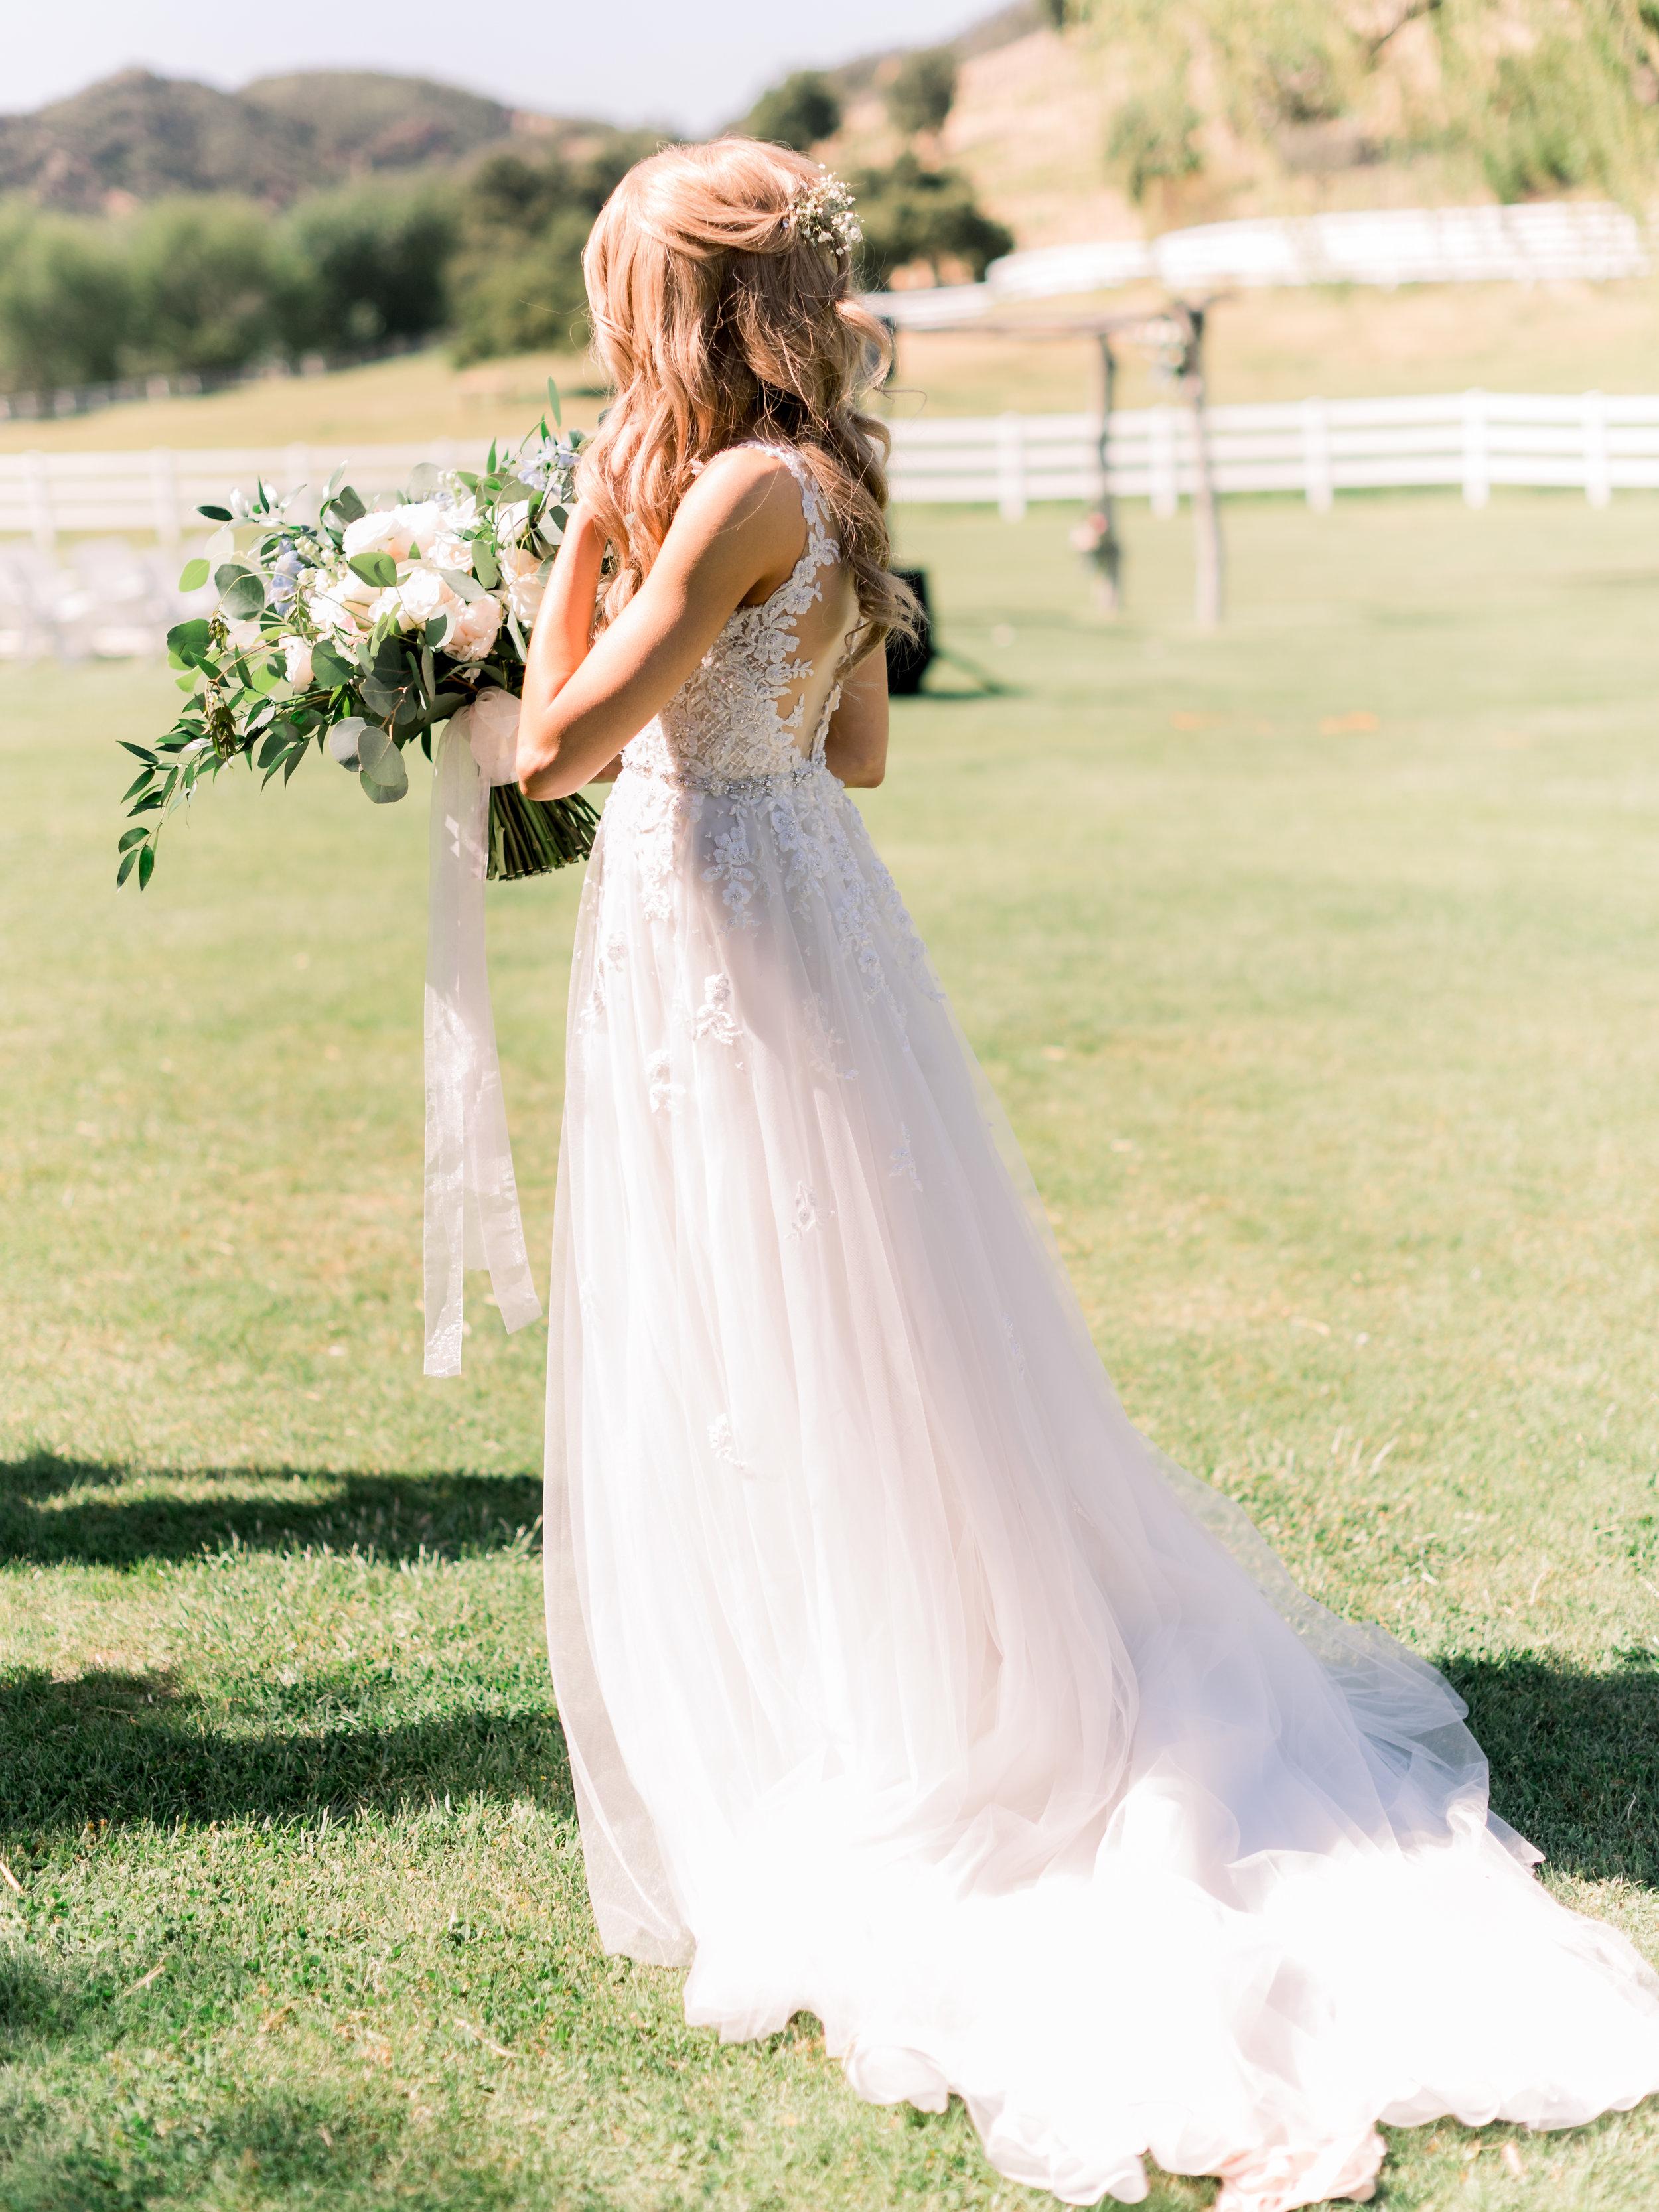 bride-walking-through-the-grass.jpg